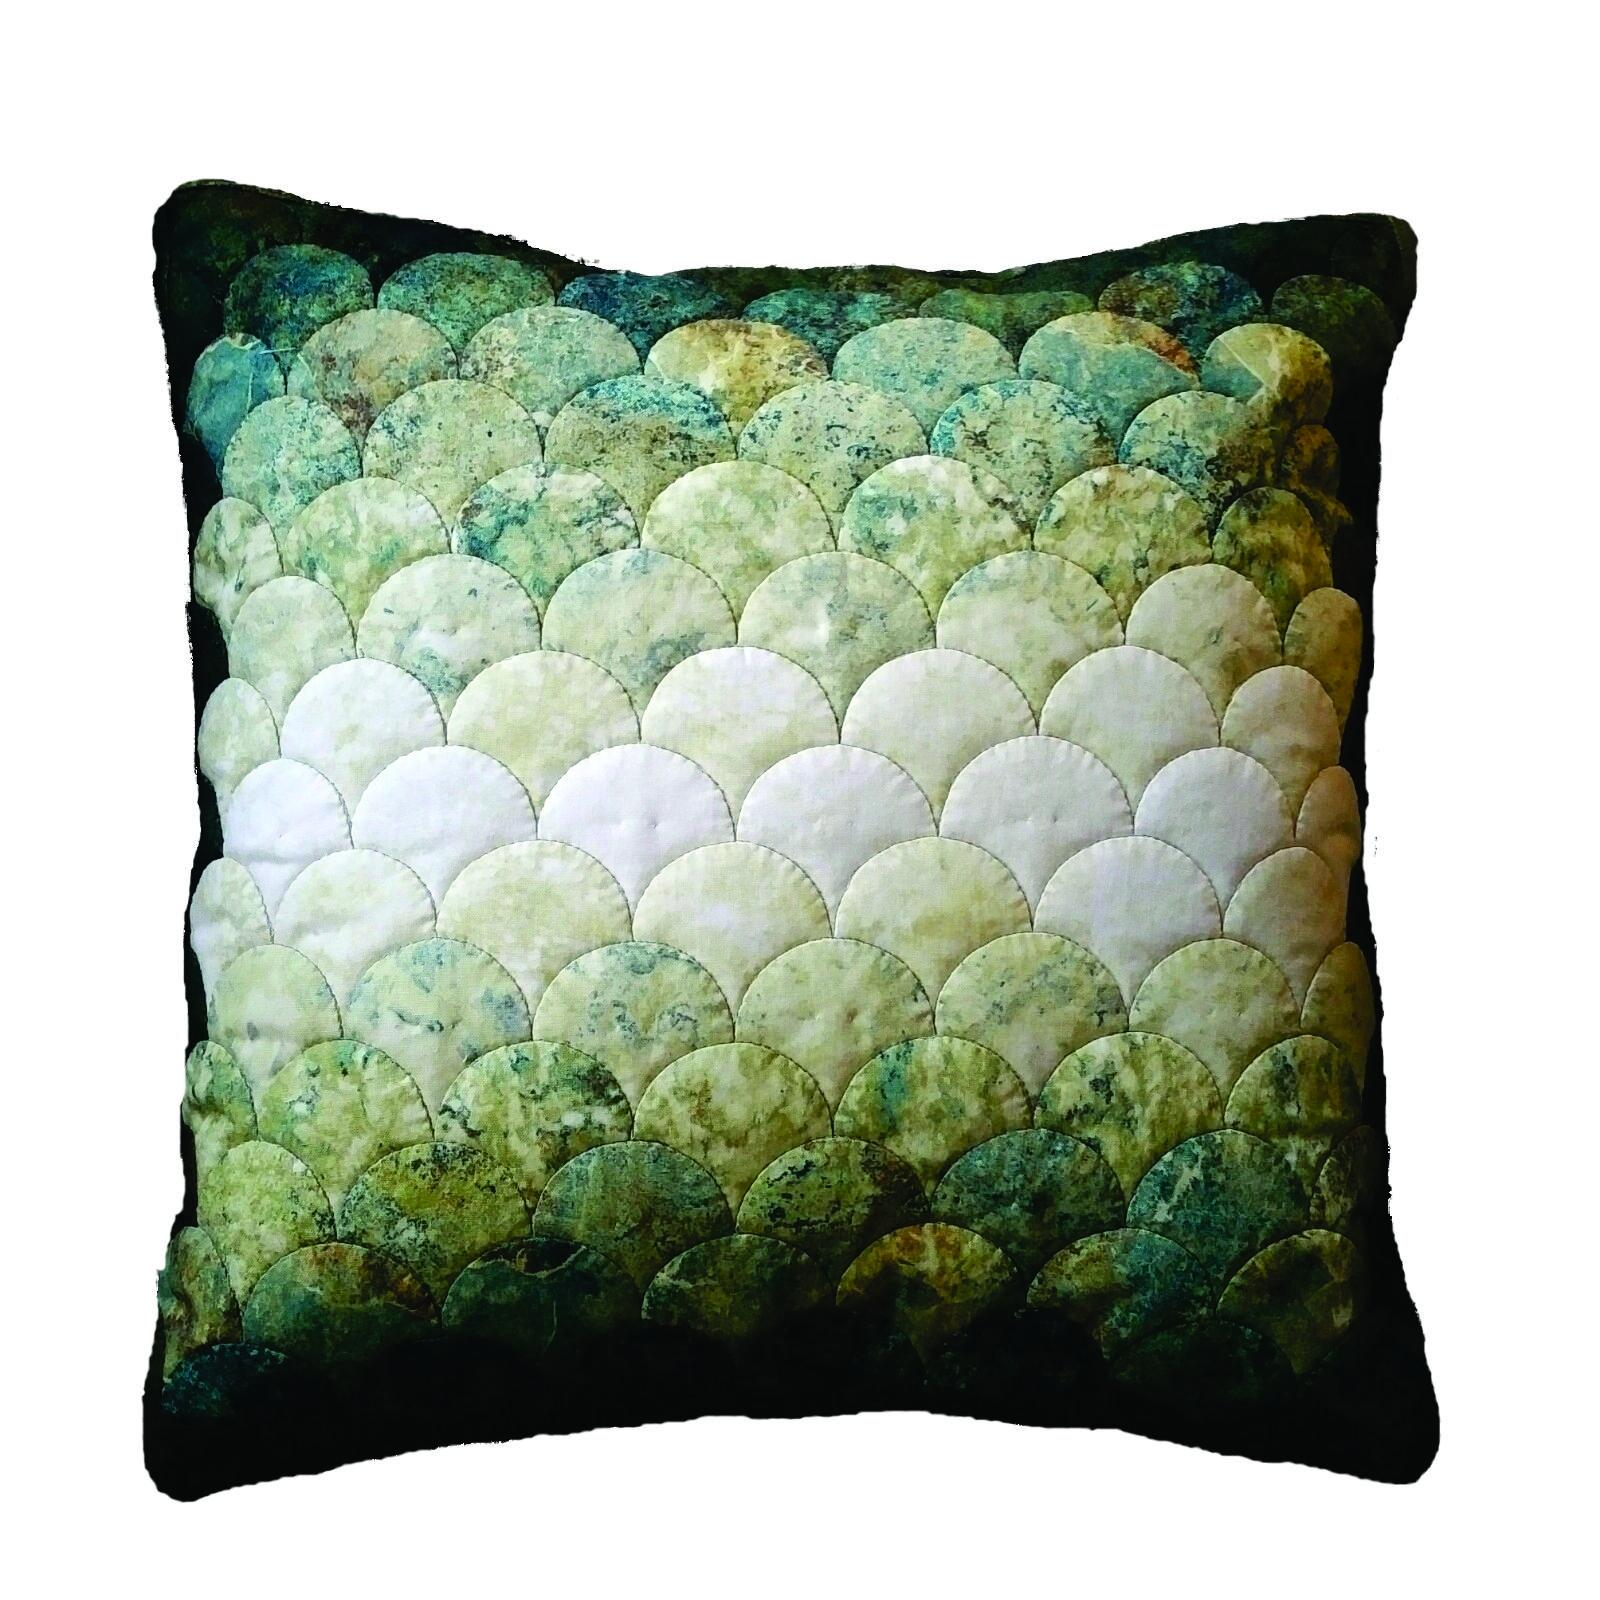 WKW.2,d - Captivating Clamshell Cushion  - WORKSHOP